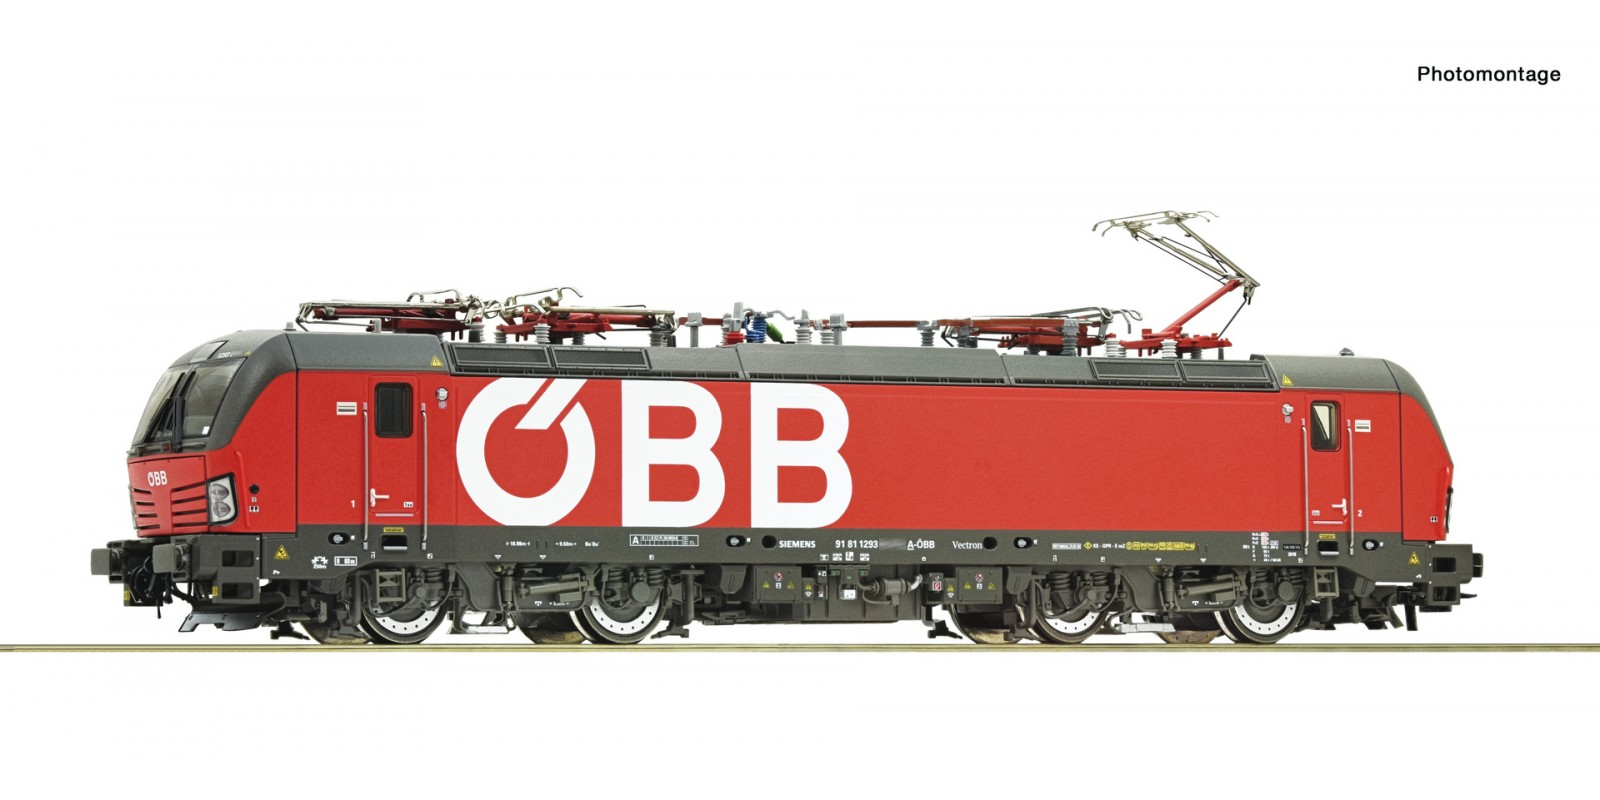 RO71958 Electric locomotive class 1293